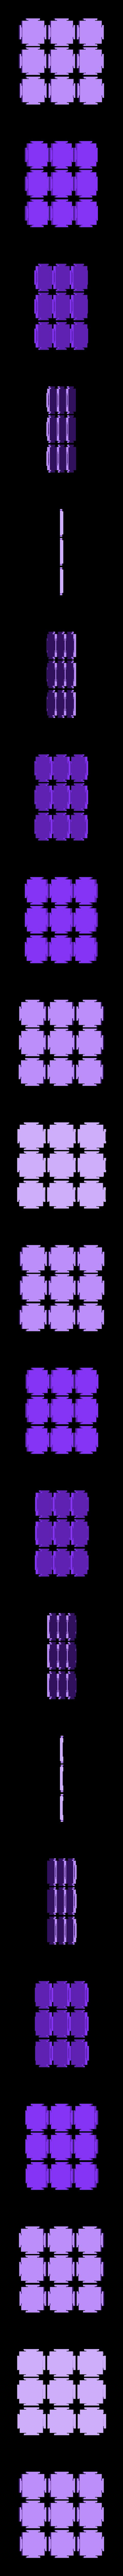 Tray_1_2.stl Download free STL file Chess set / Chess set • 3D printable model, OC3D